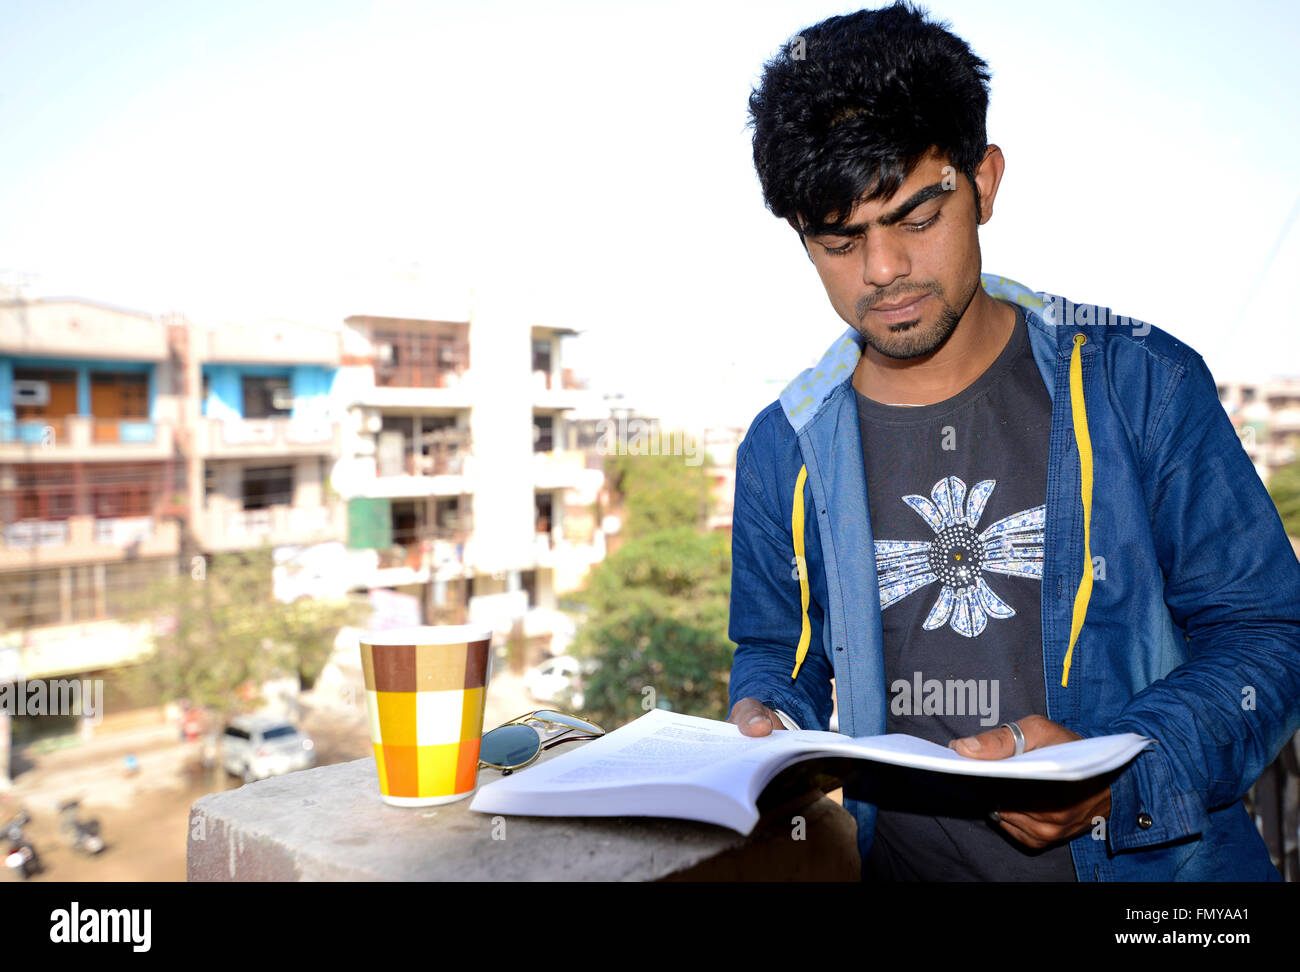 Handsome man reading on balcony - Stock Image